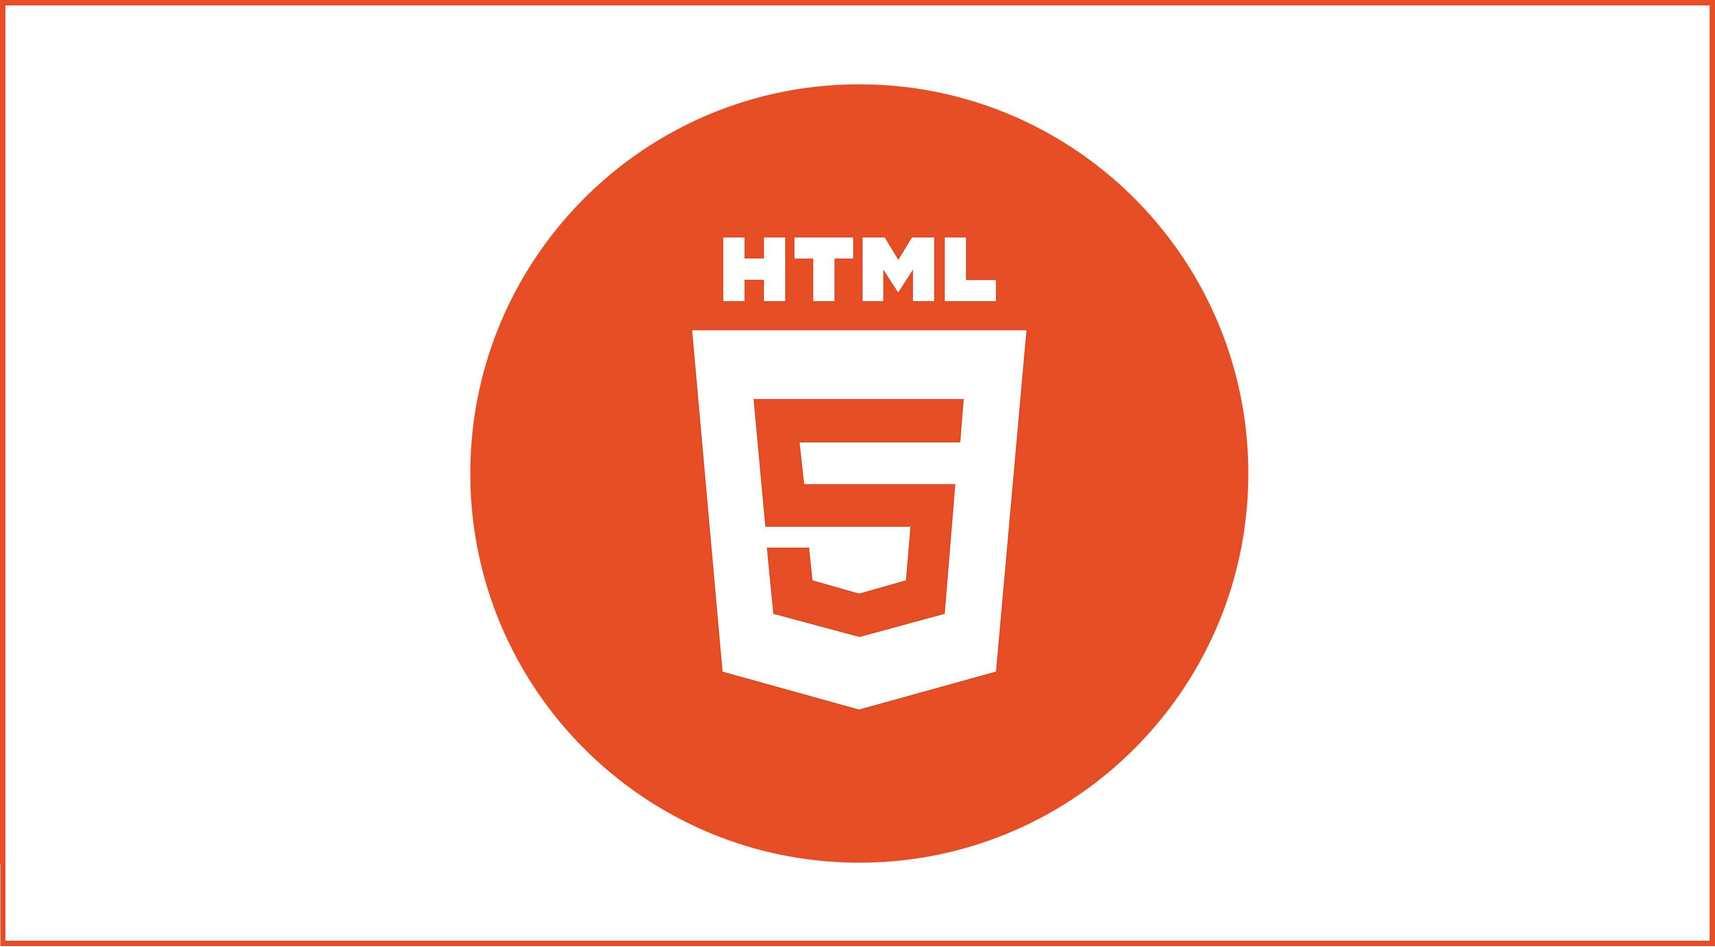 Проверка веб-сайта на соответствие HTML5